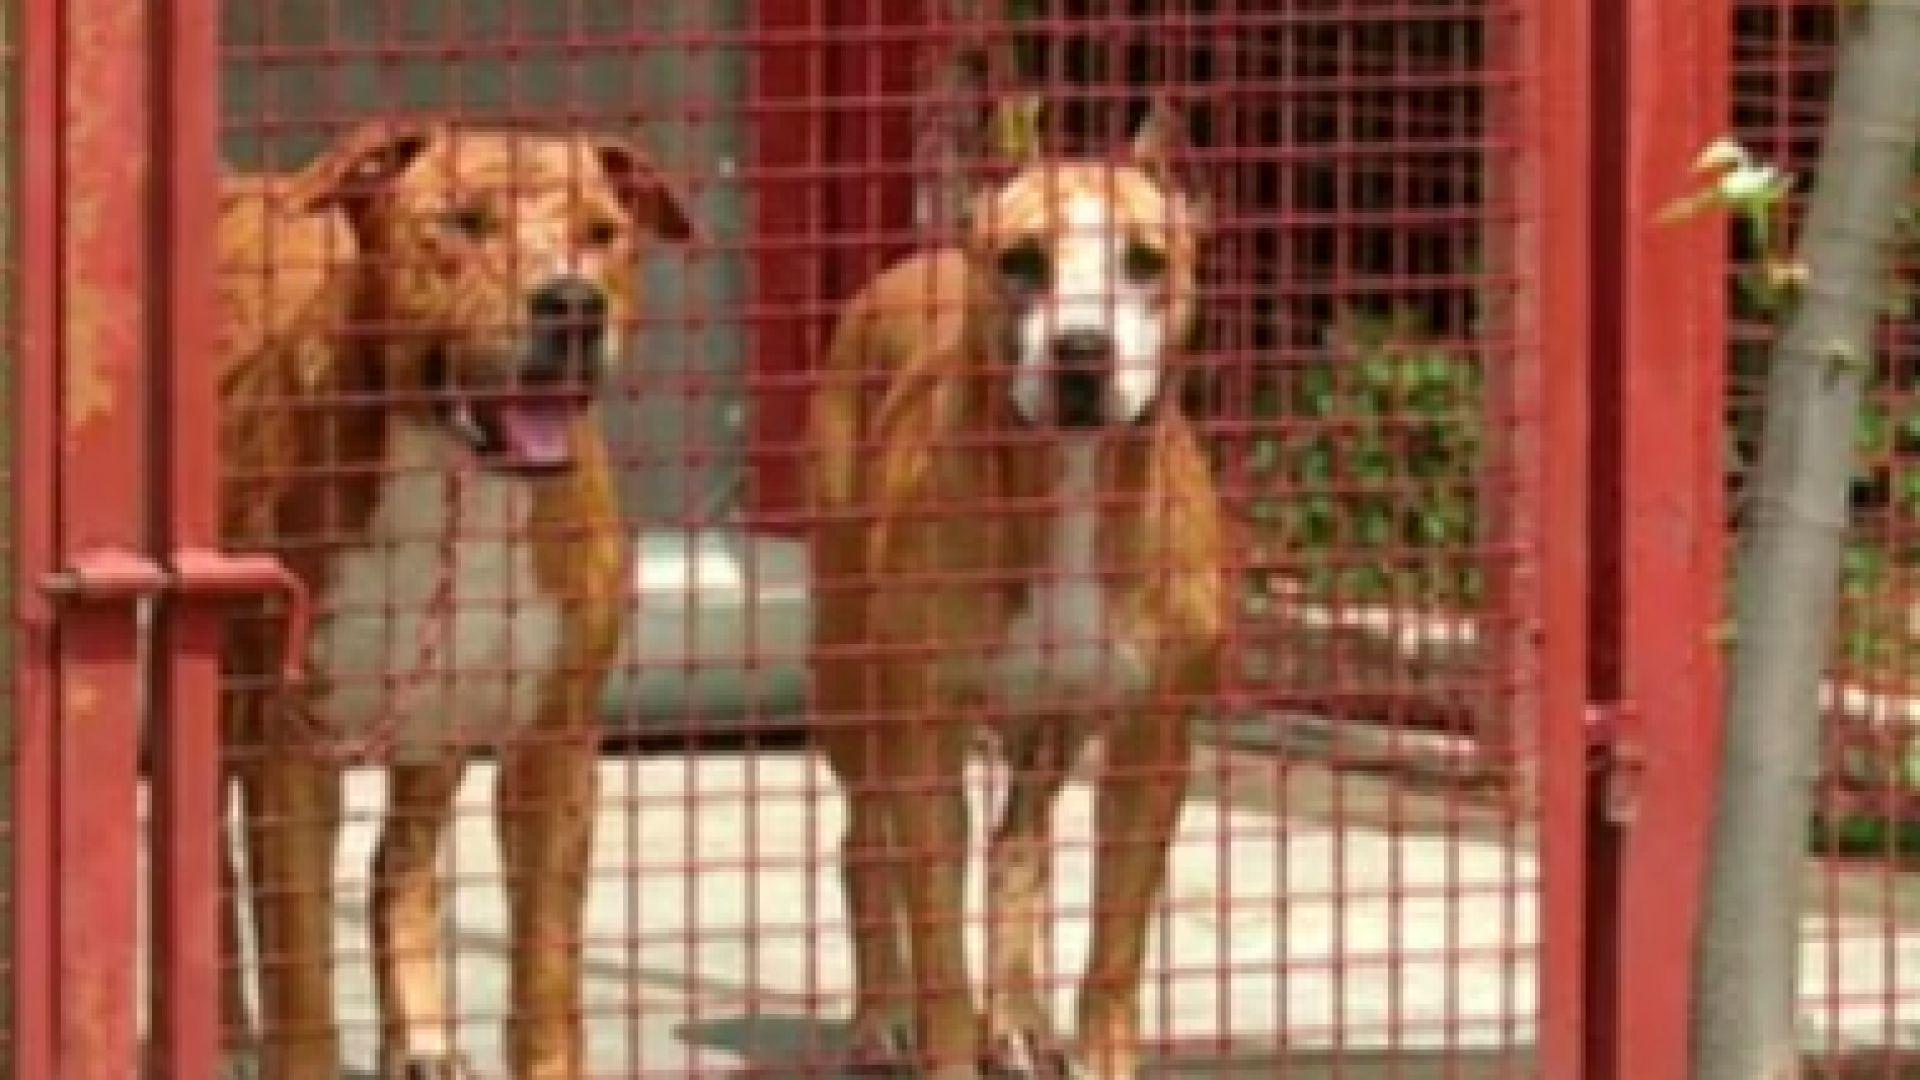 3 години близо 40 кучета, порода питбул, тренирани за боеве,